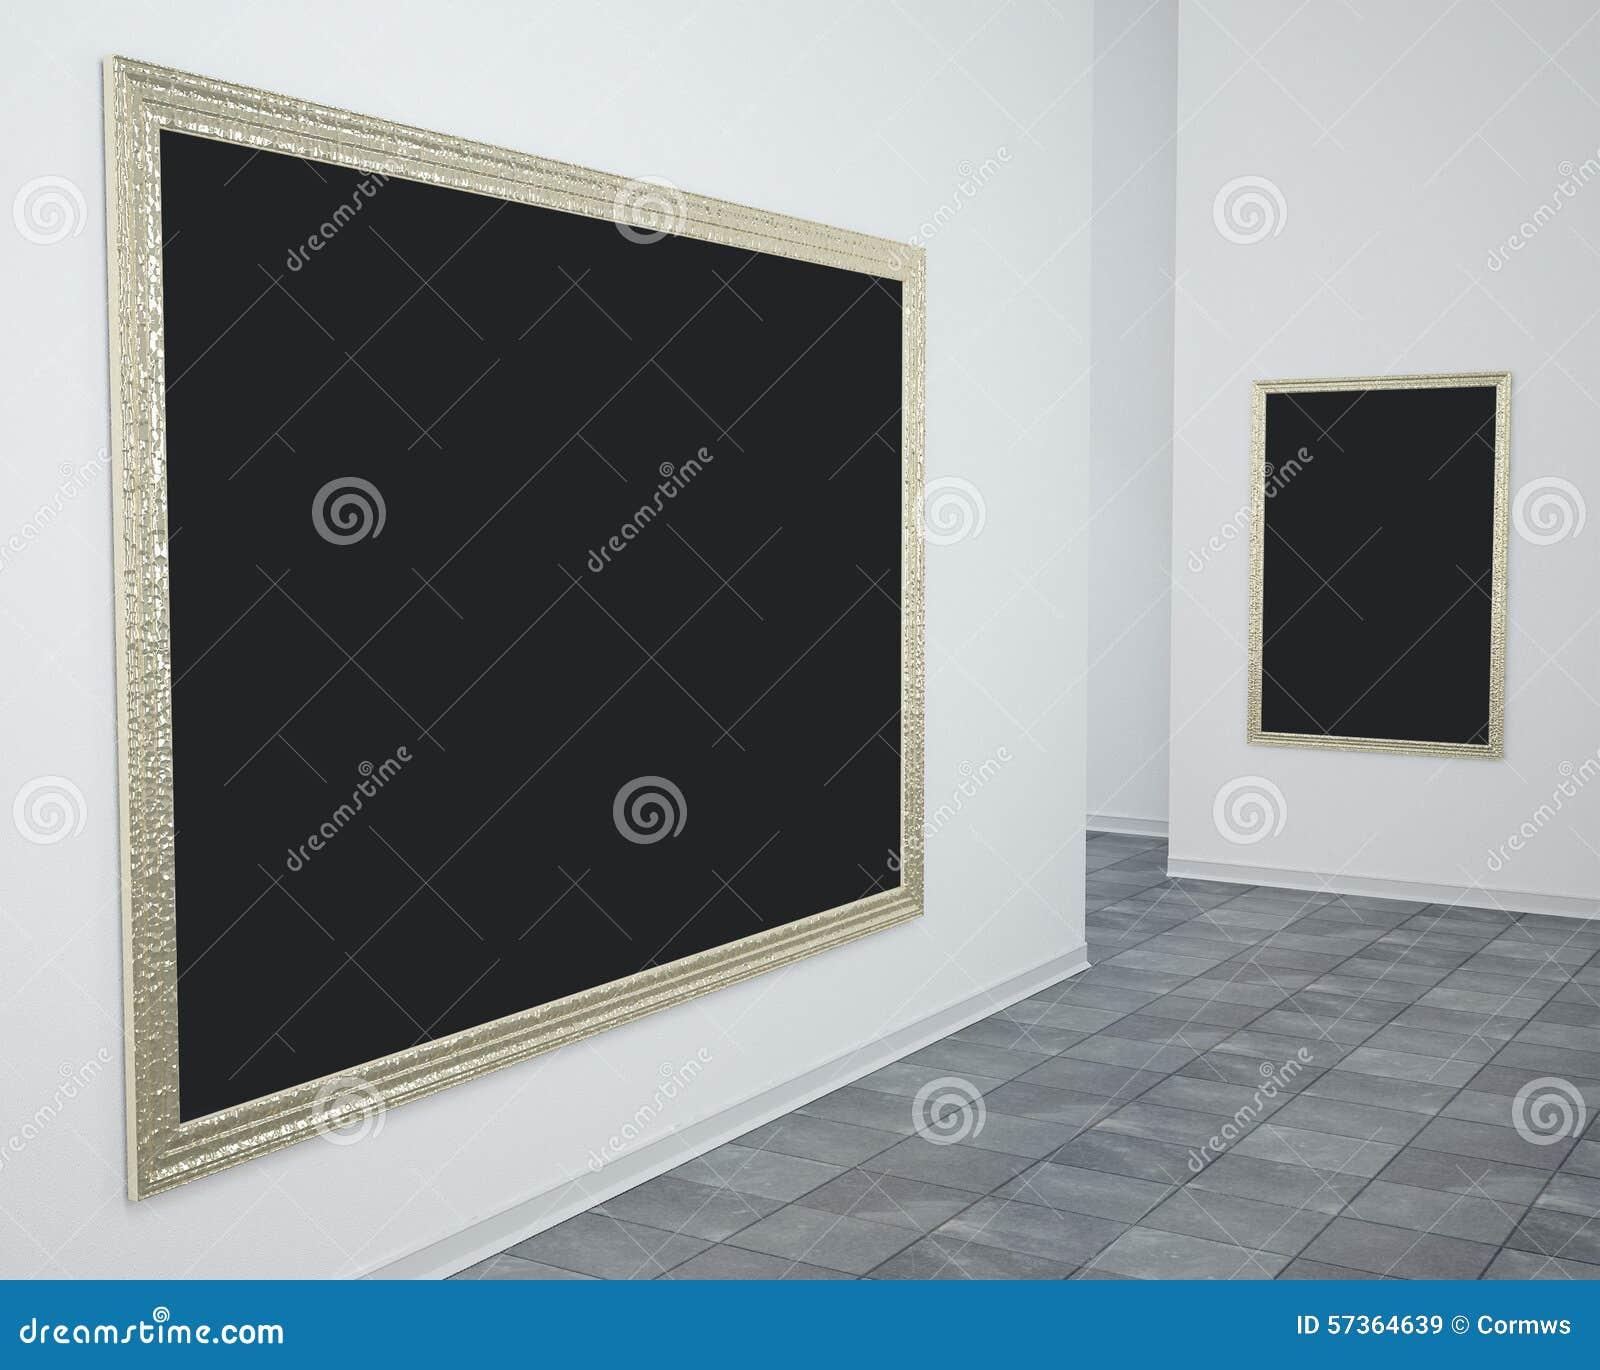 Galerie-Bilderrahmen stockbild. Bild von bild, golden - 57364639